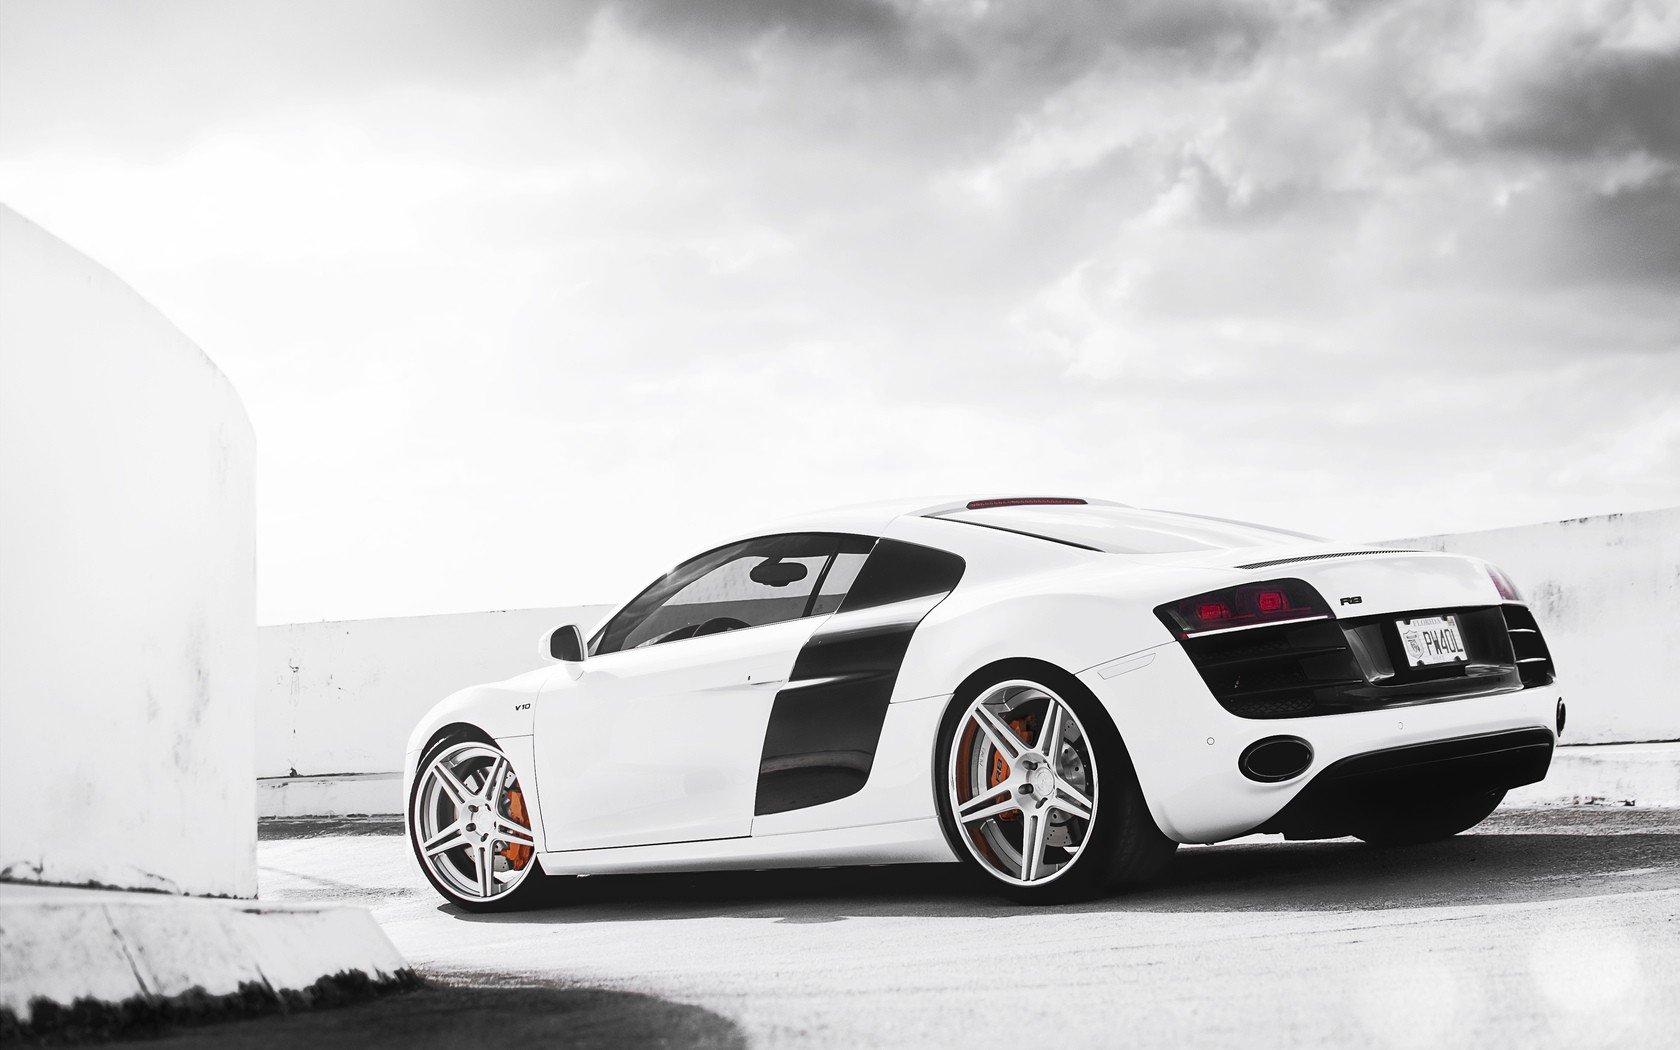 White Cars Audi Vehicles Wheels Audi R8 Bags Sports Cars Luxury Sport Cars Wallpaper 1680x1050 244524 Wallpaperup